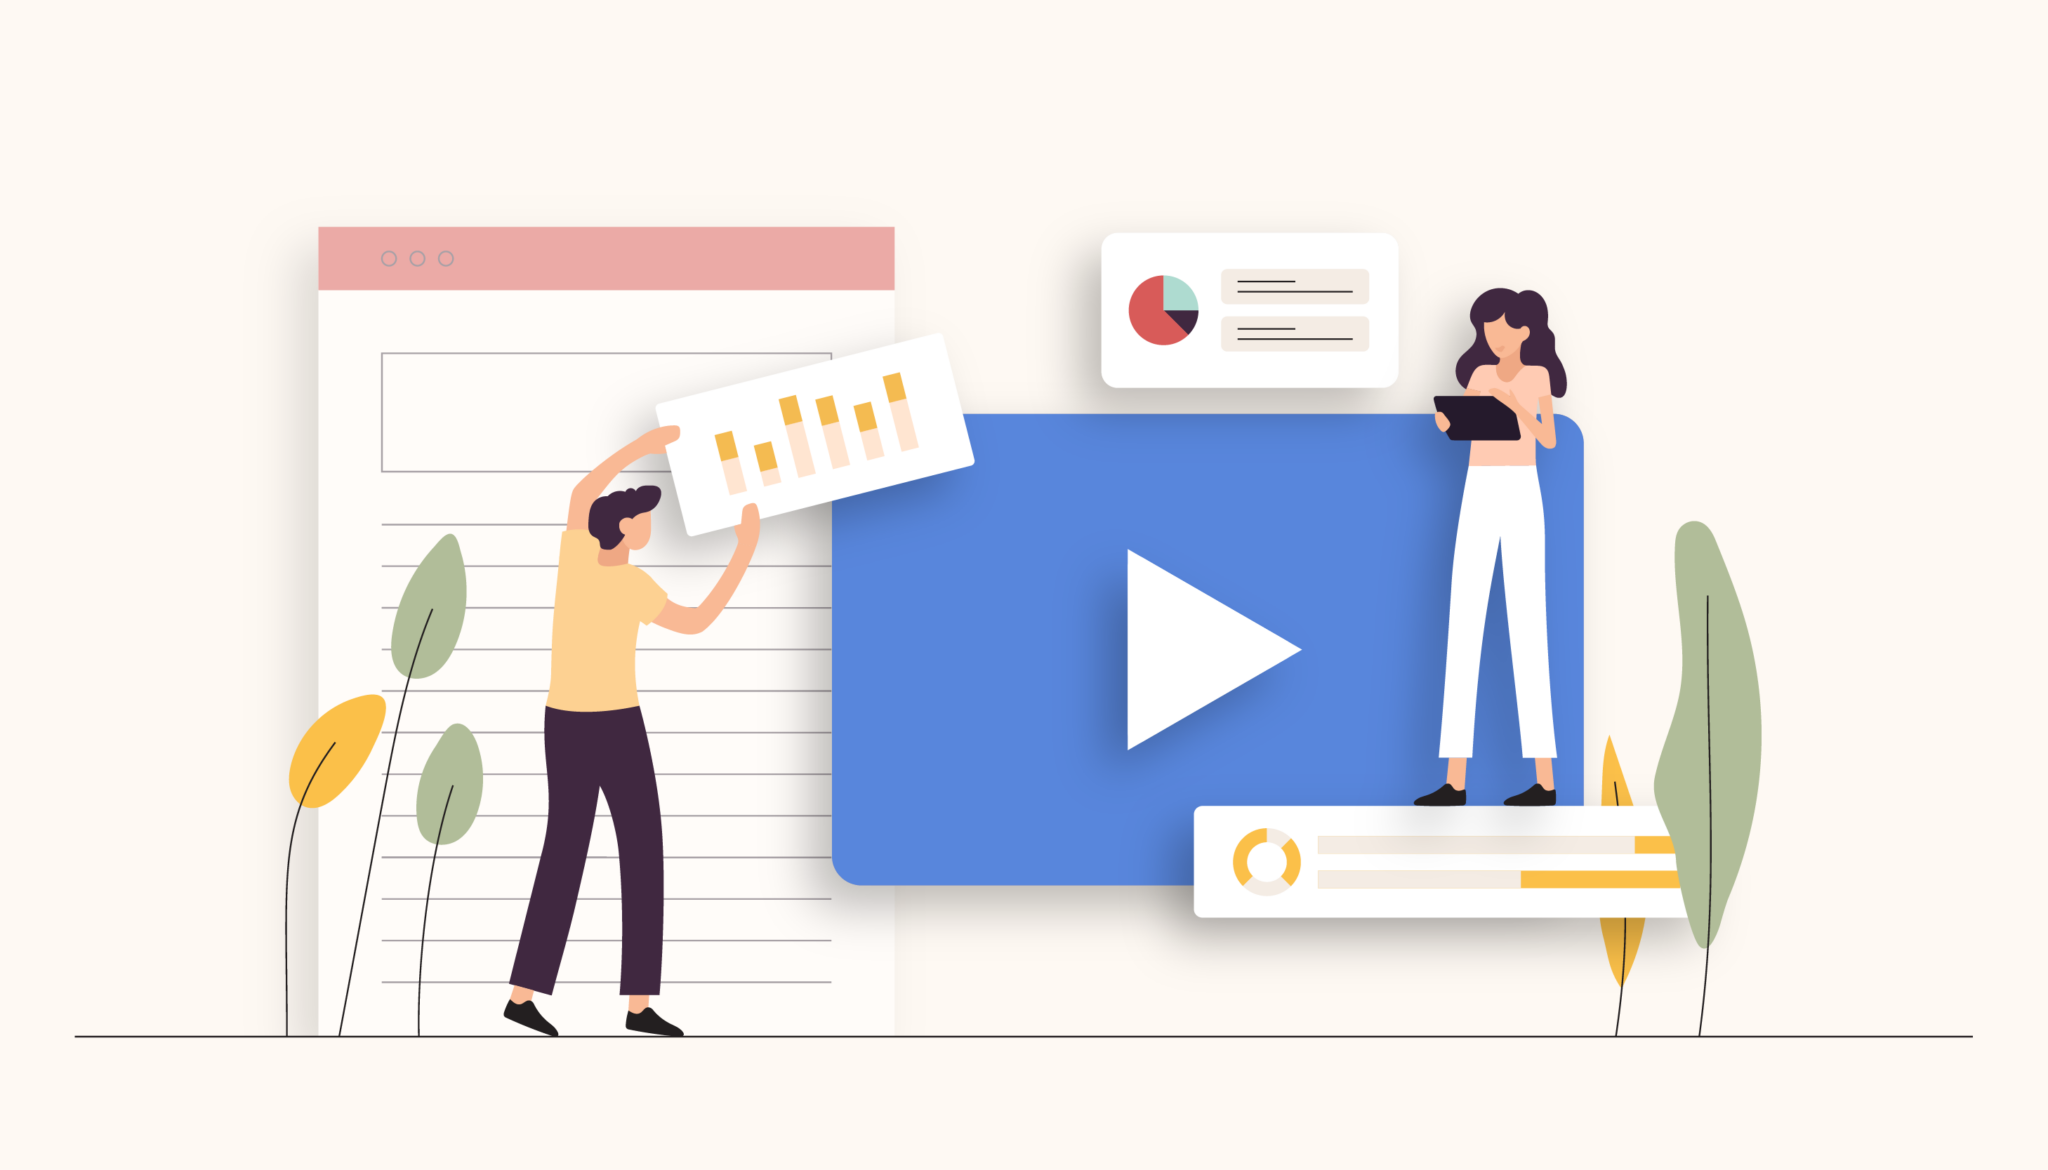 Using Video to Market to Millennials